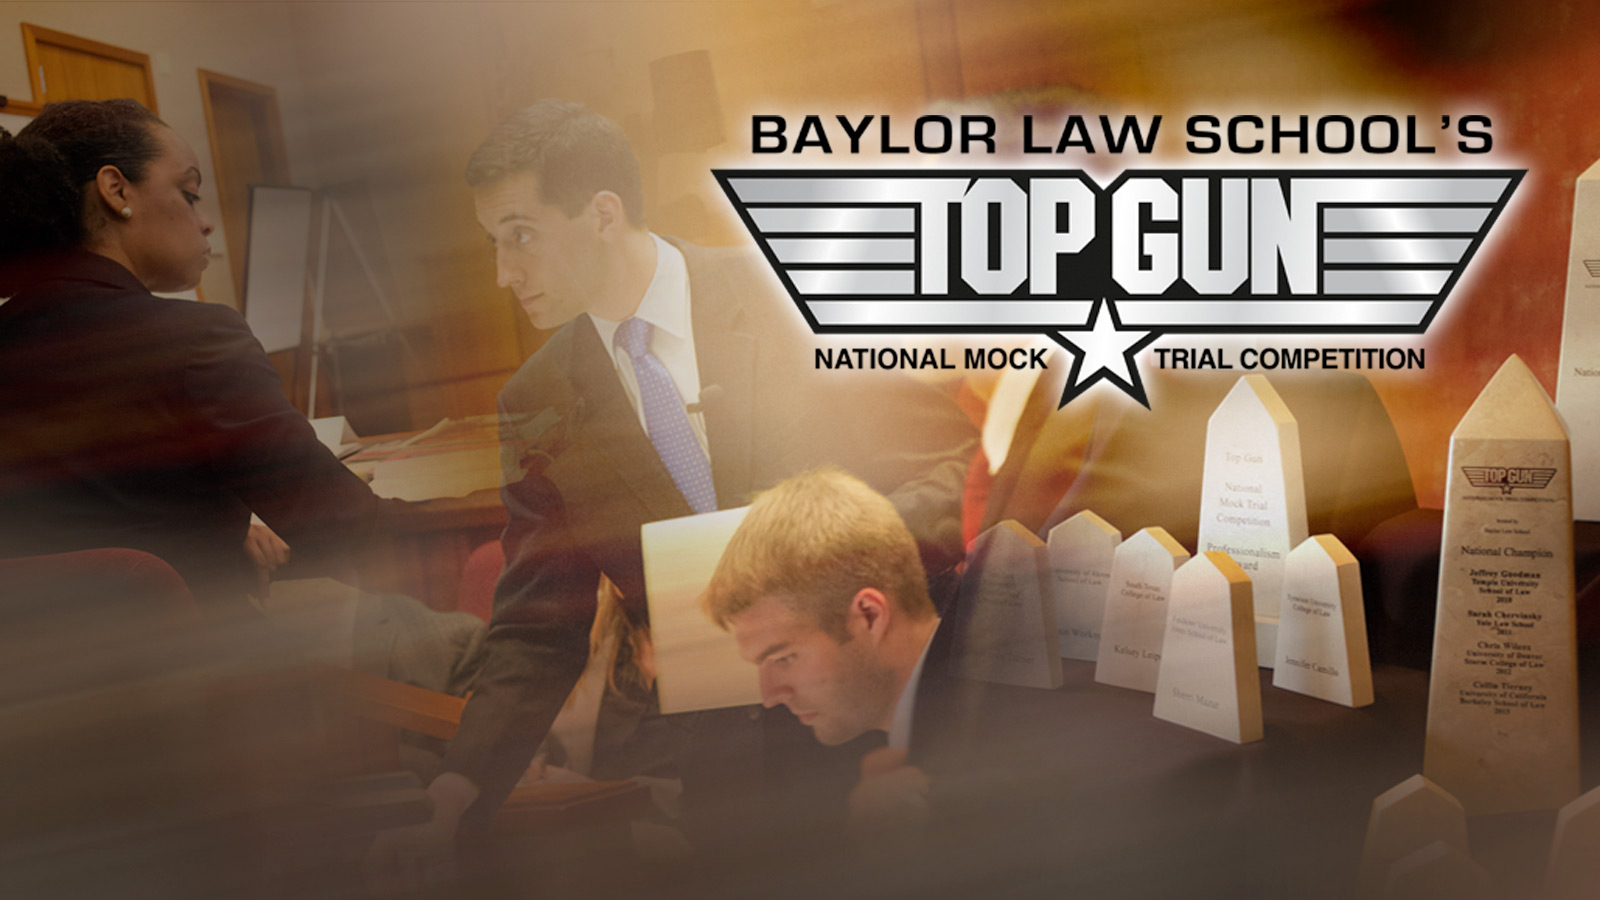 Baylor Law's Top Gun